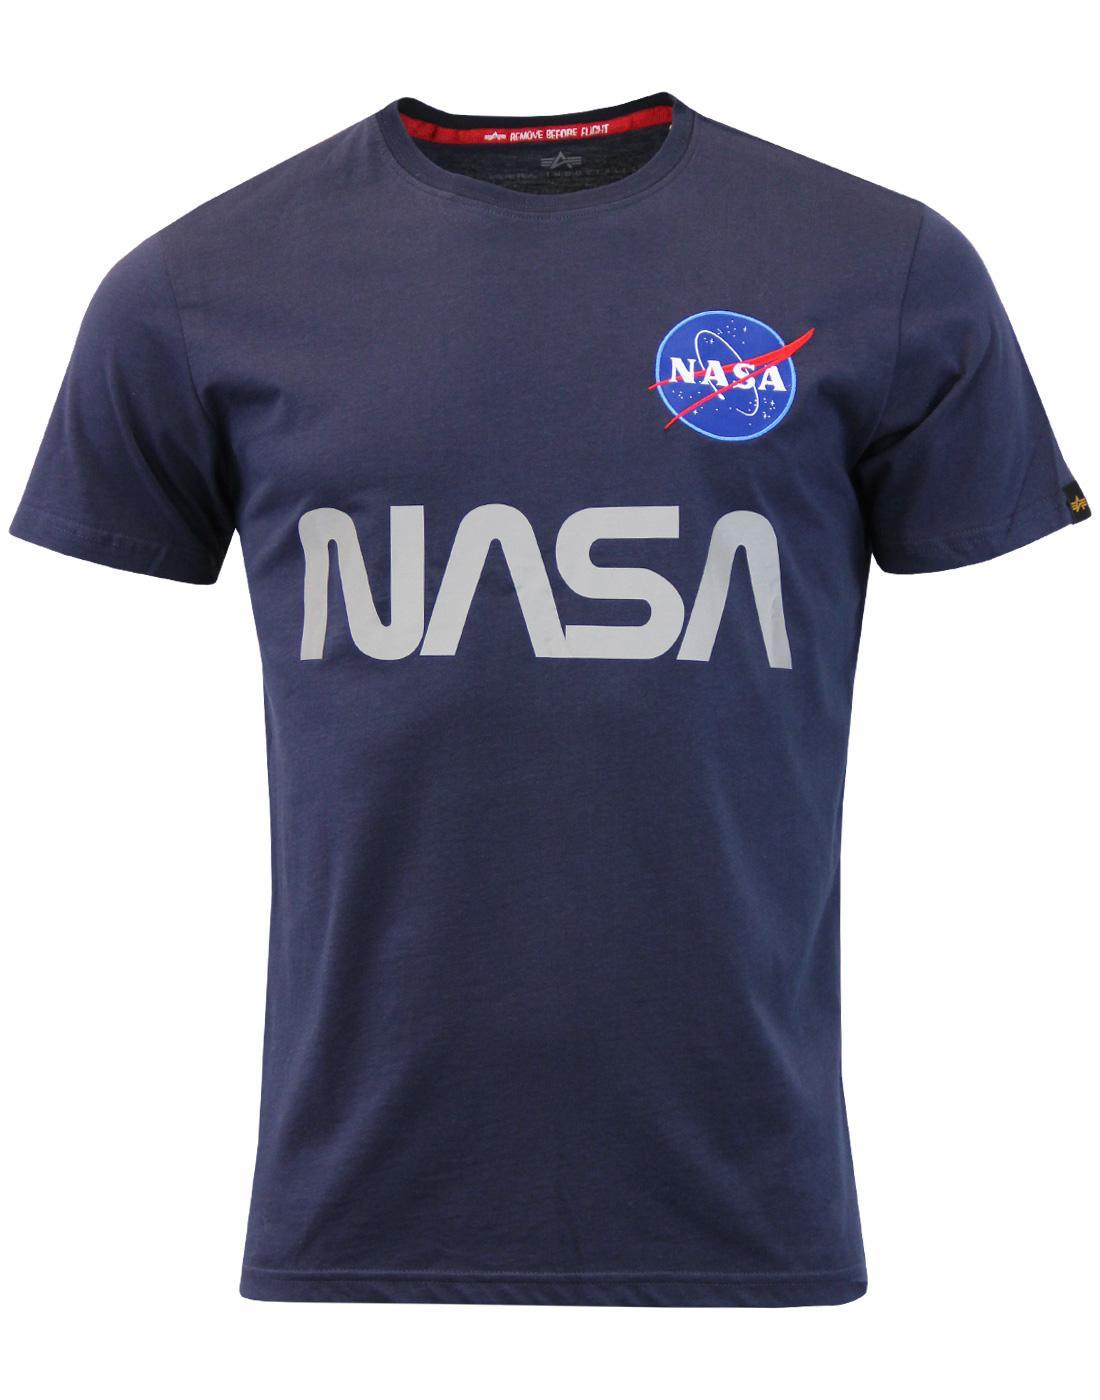 ALPHA INDUSTRIES NASA Reflective Retro T-shirt